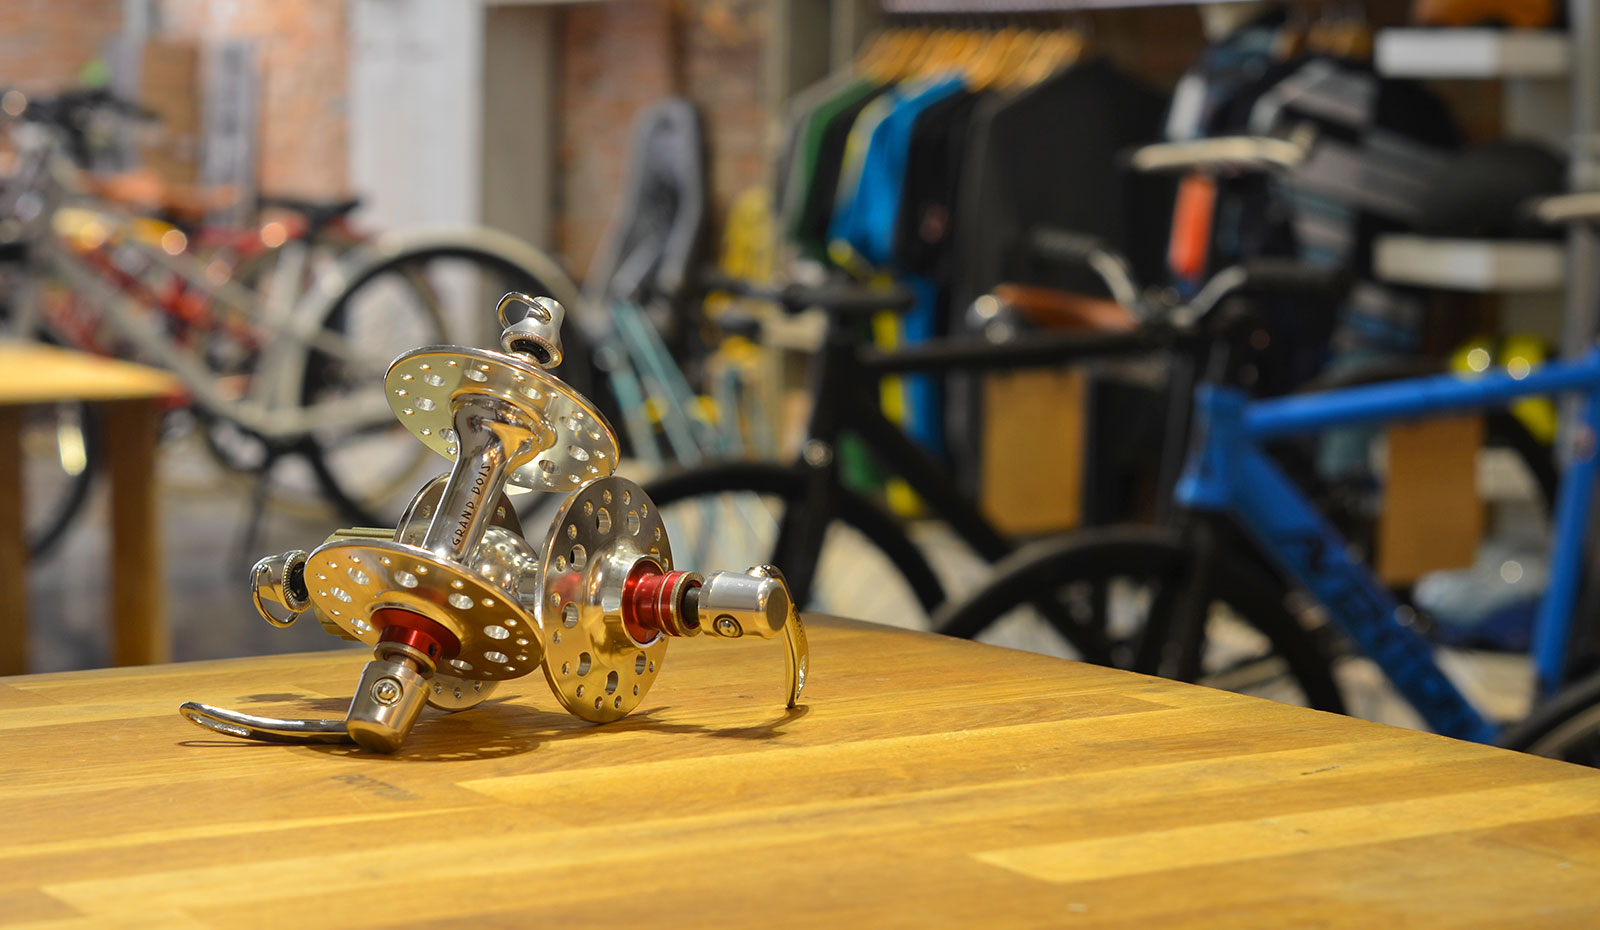 moyeux-grand-bois-velo-bike-vintage-hub